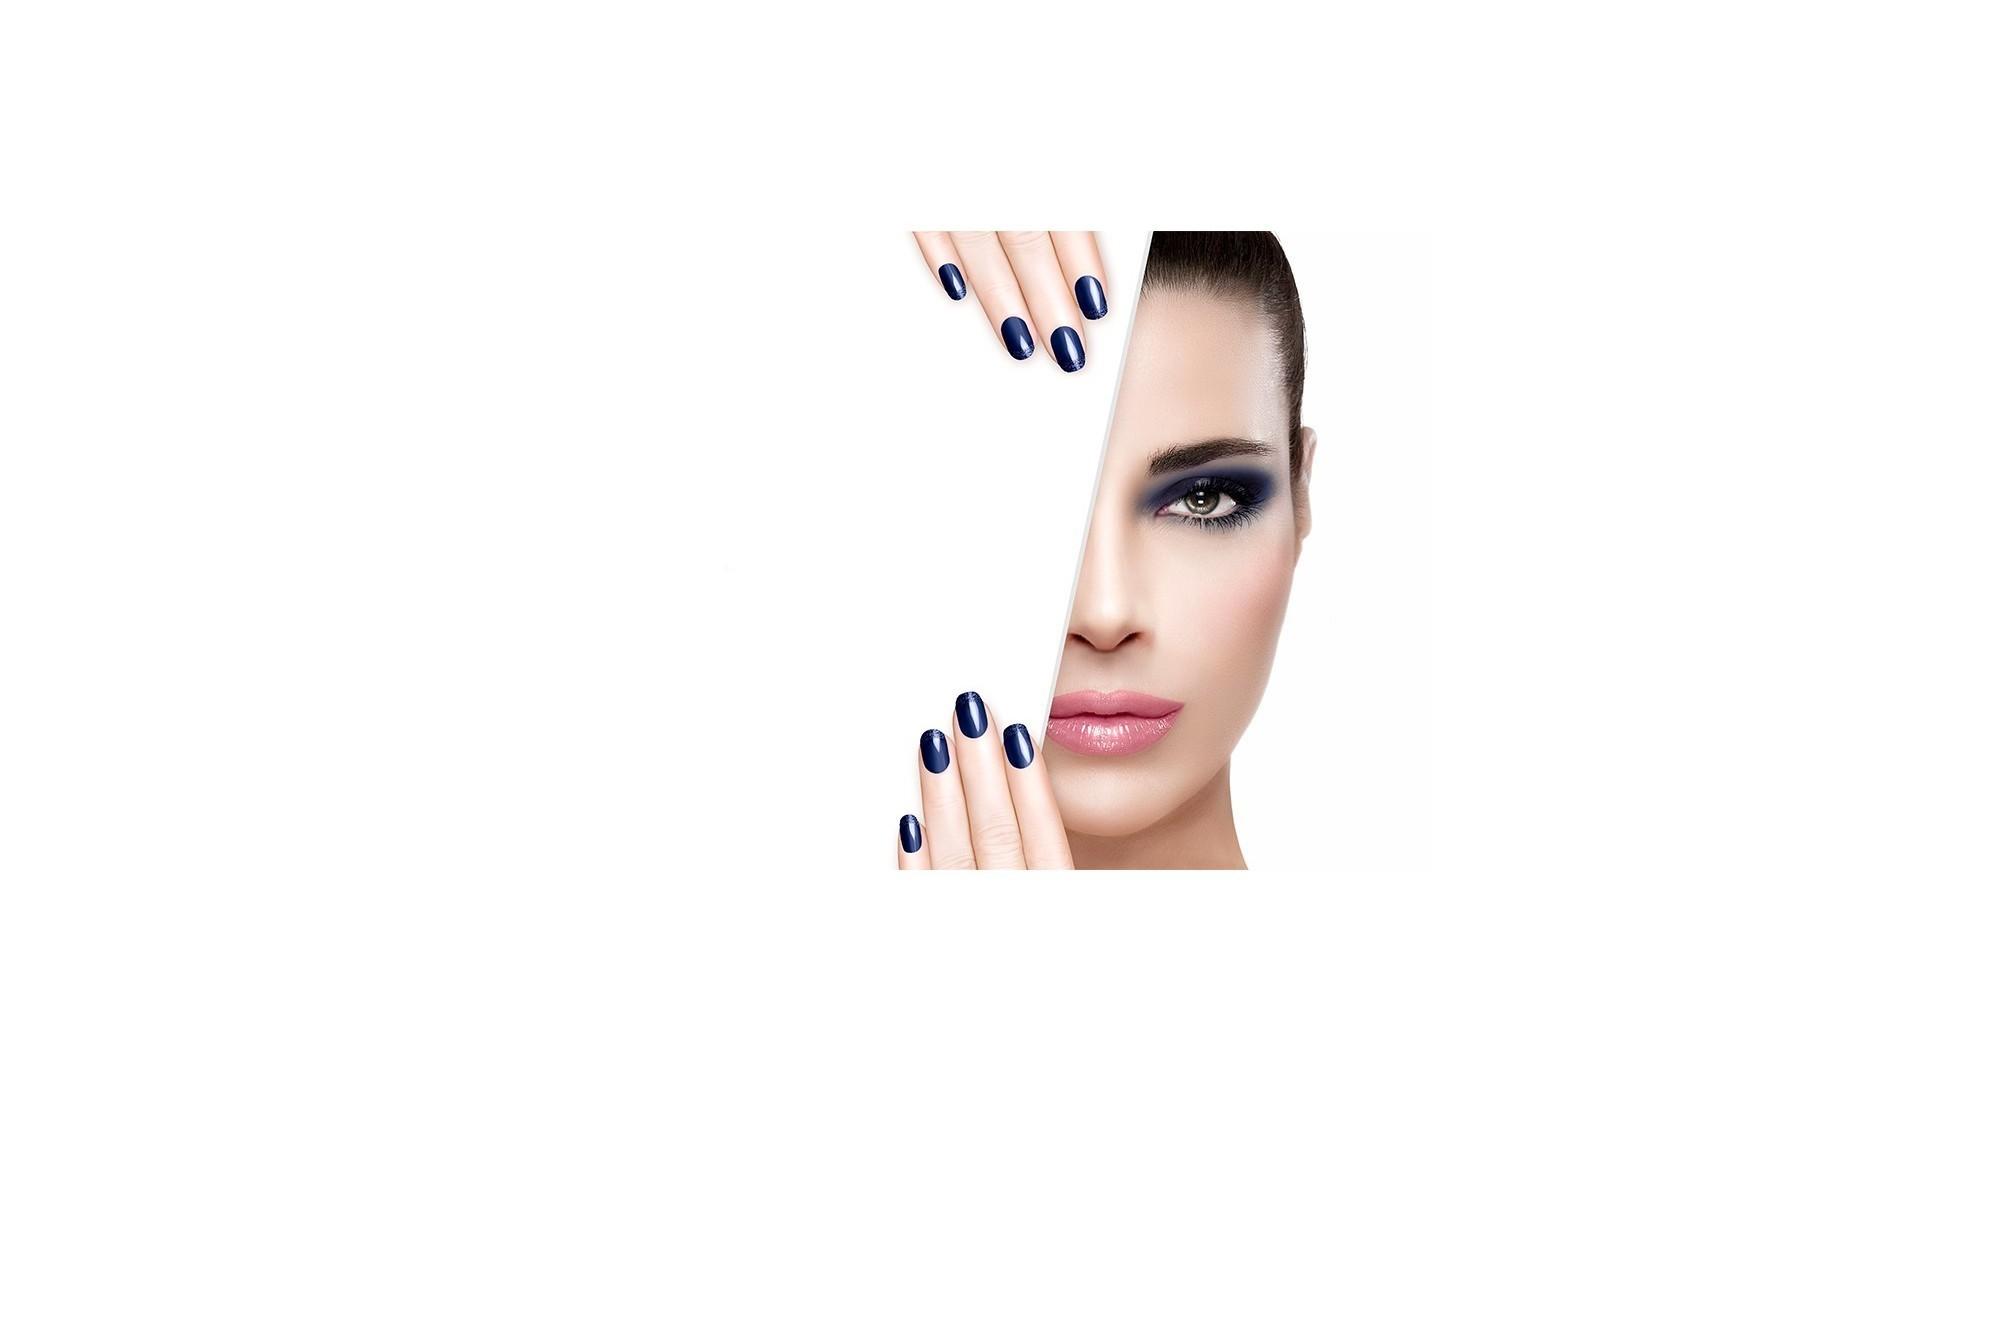 Geluri make-up cover, camuflaj, Gel Uv LED